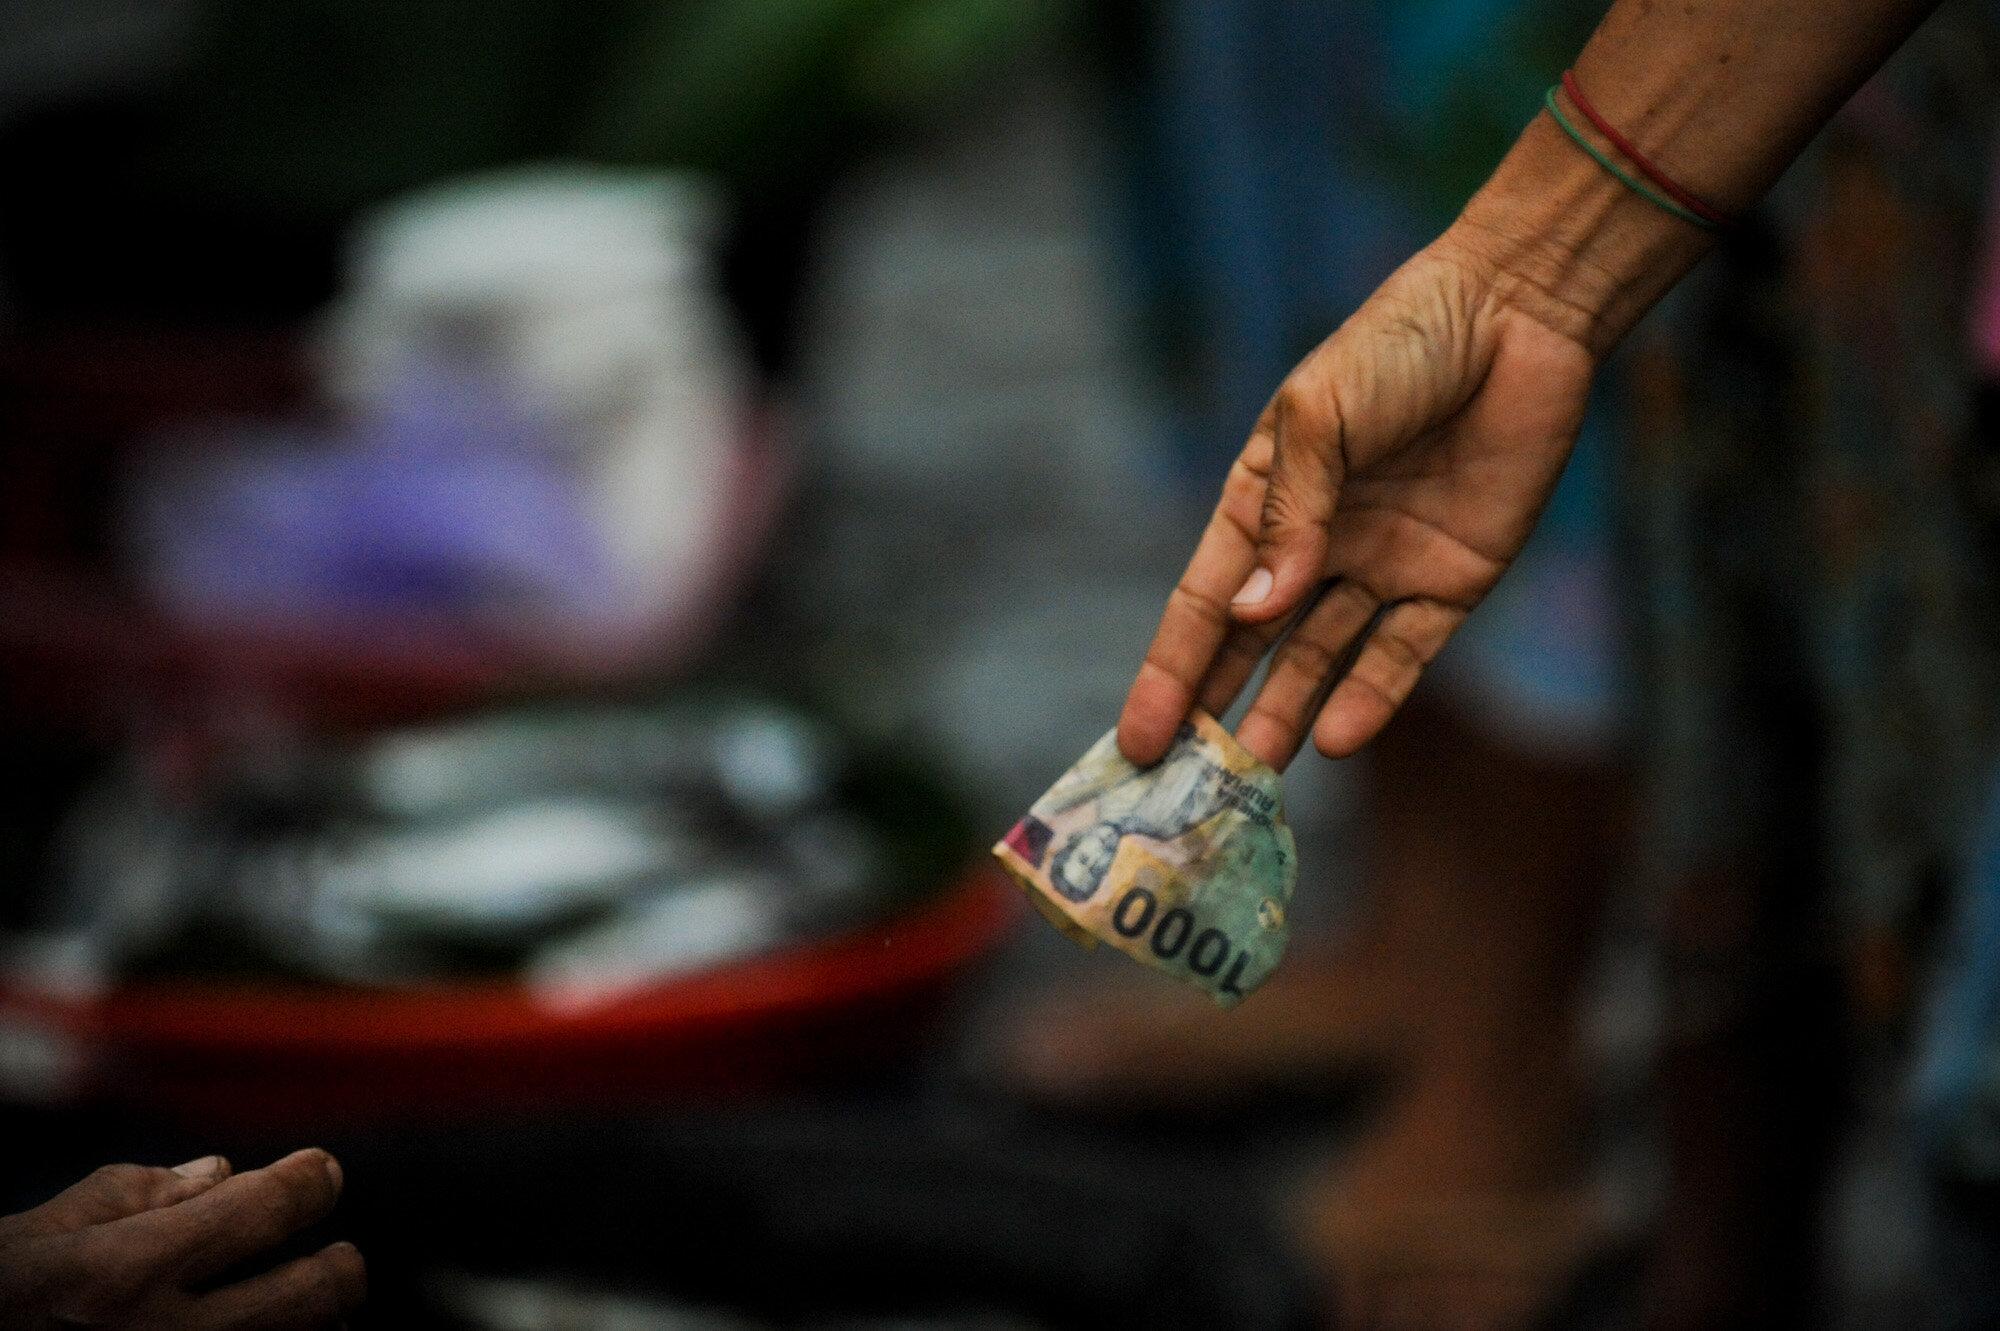 Credit: Ariel D Javellana / DER / Asian Develpoment Bank